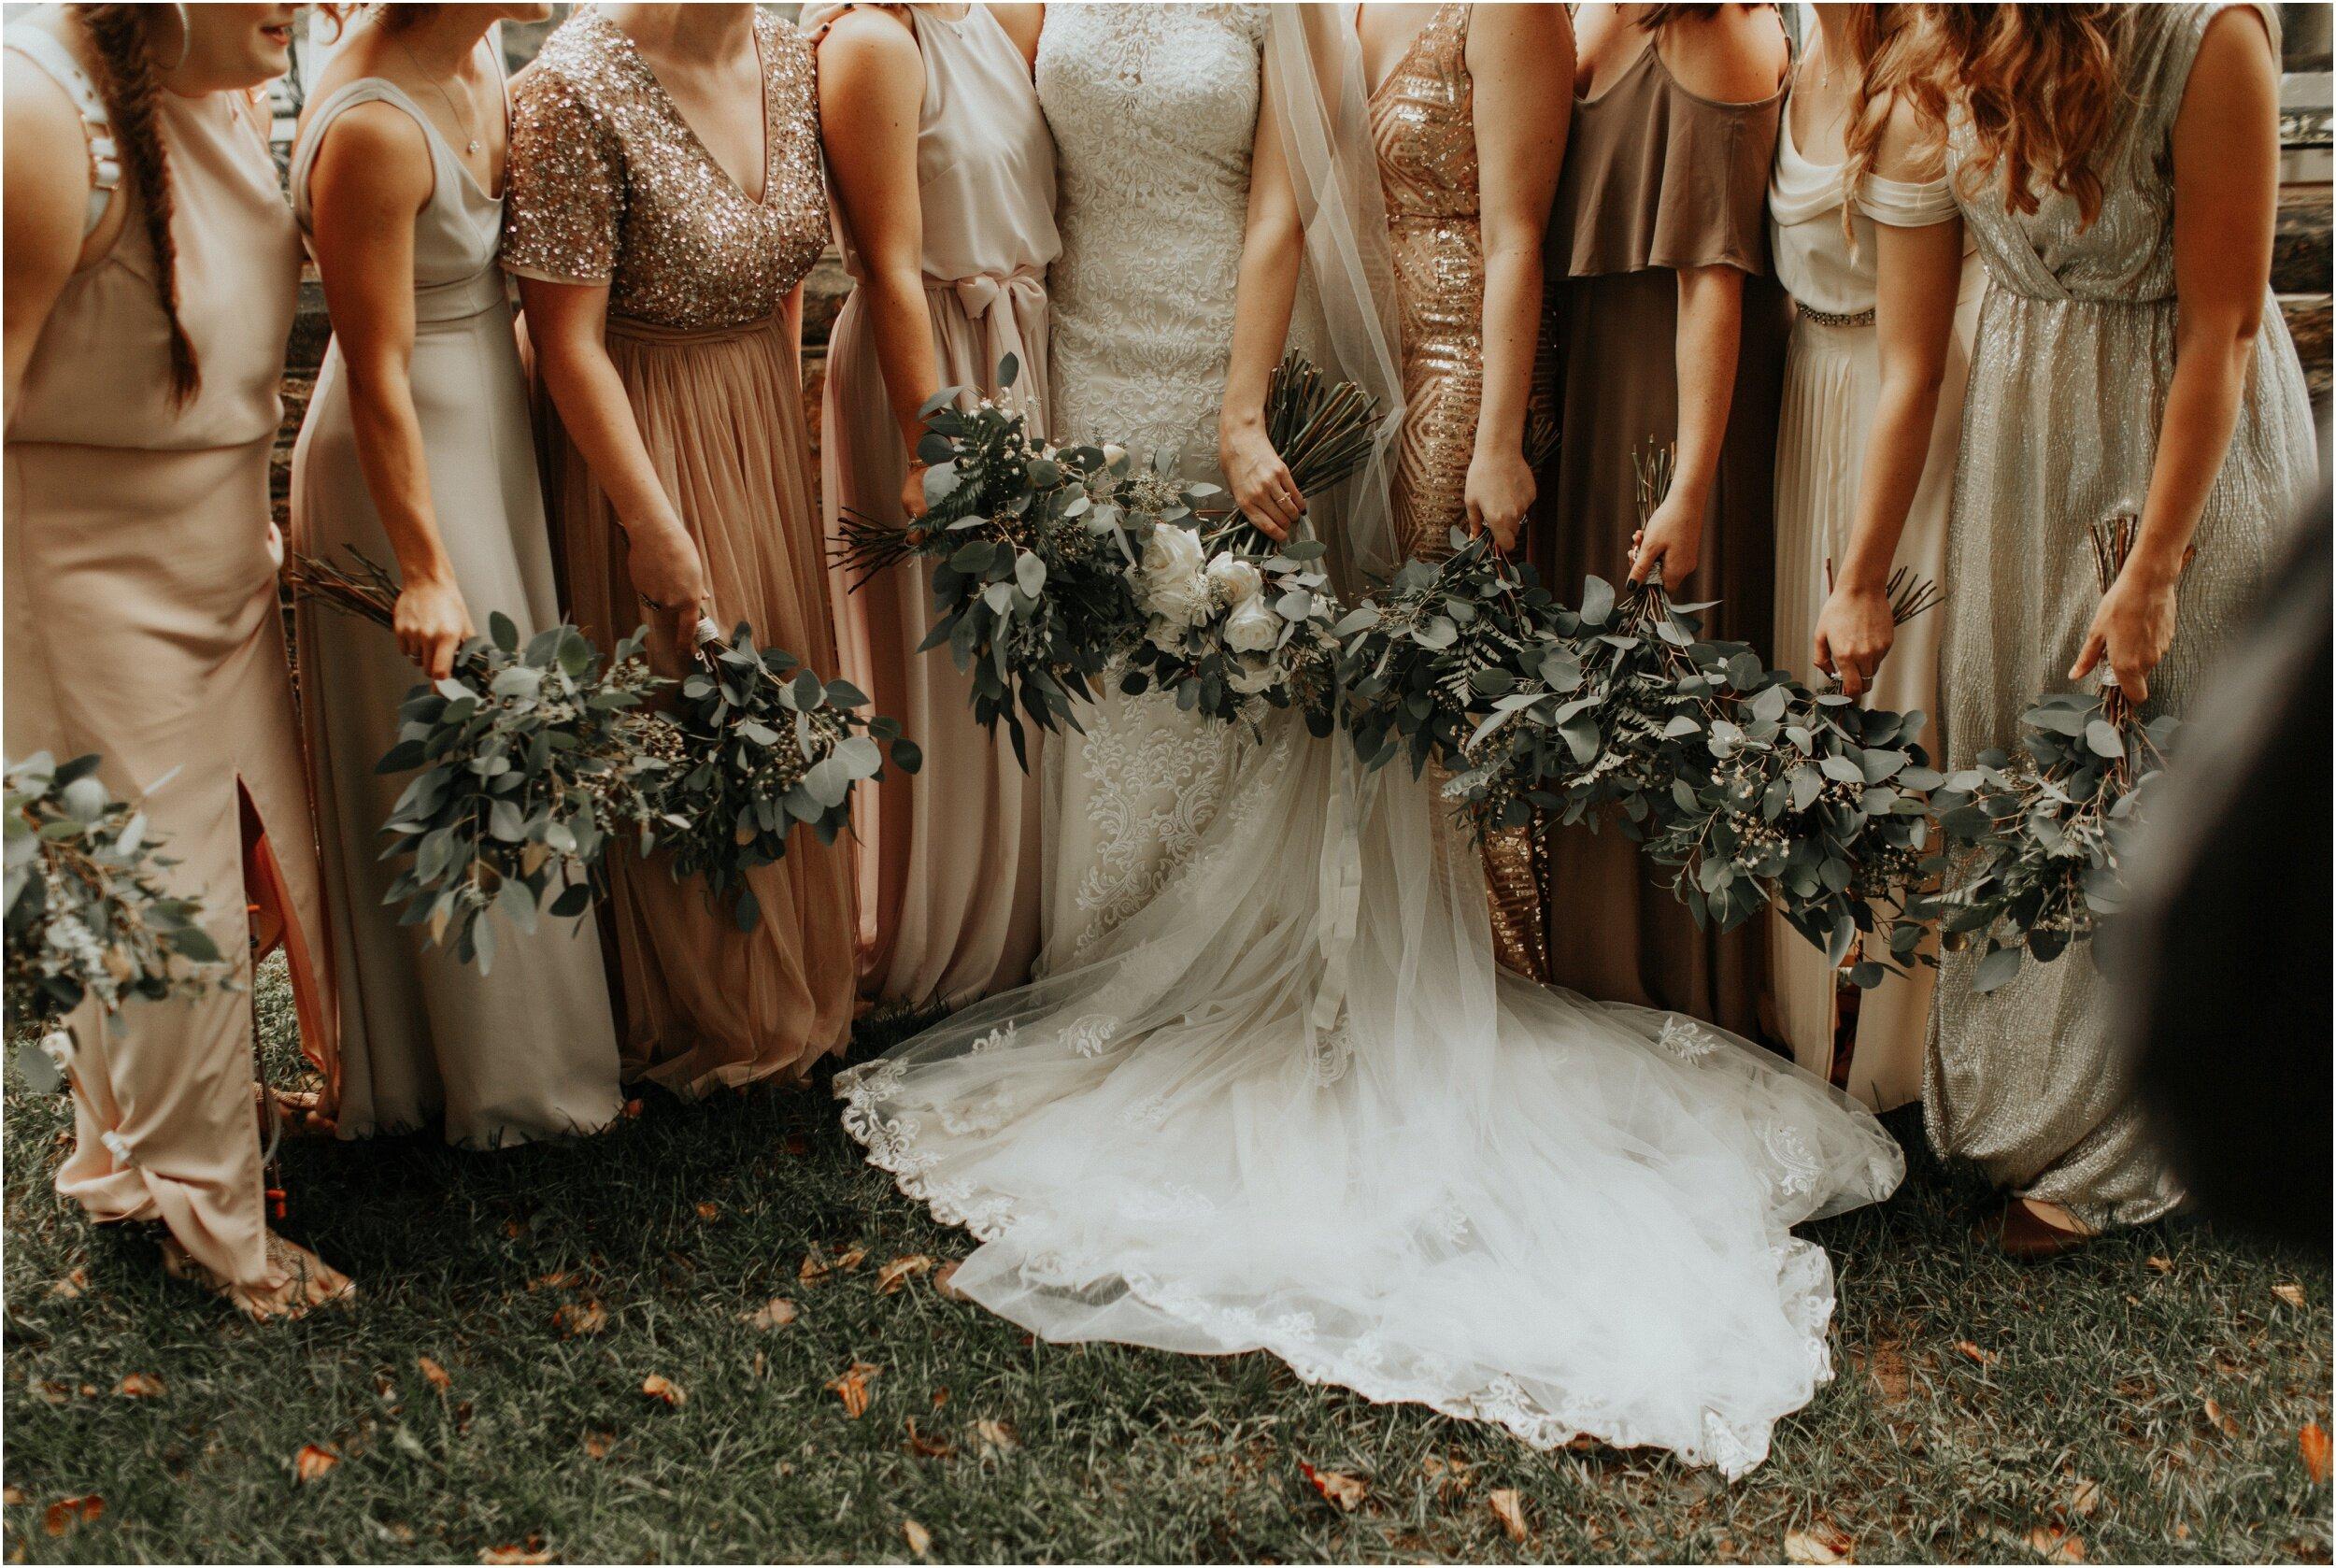 steph-and-jordan-cox-our-wedding-historic-shady-lane-compass-wedding-collective-hazel-lining-photography-destination-elopement-wedding-engagement-photography_0047.jpg